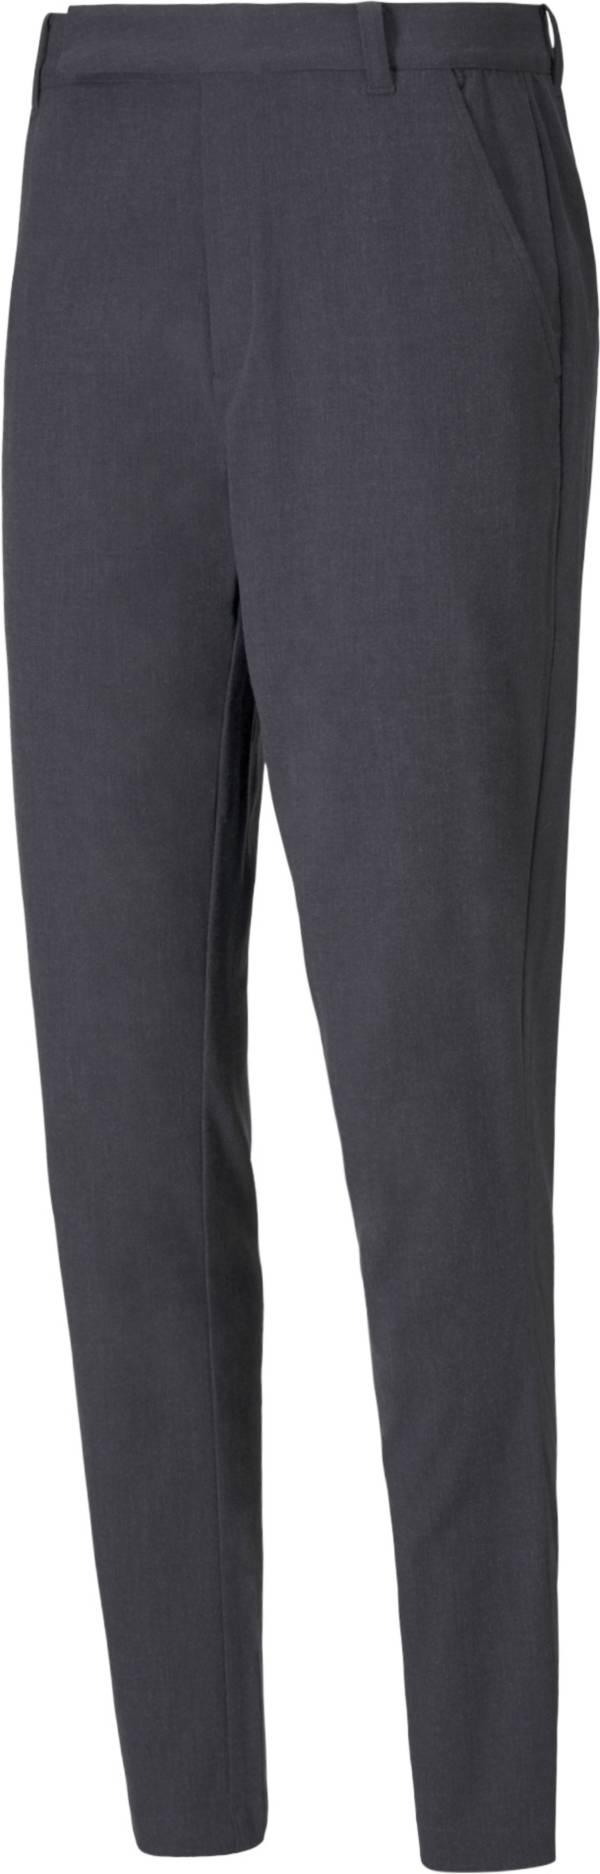 PUMA x Arnold Palmer Men's AP Tab Golf Trousers product image